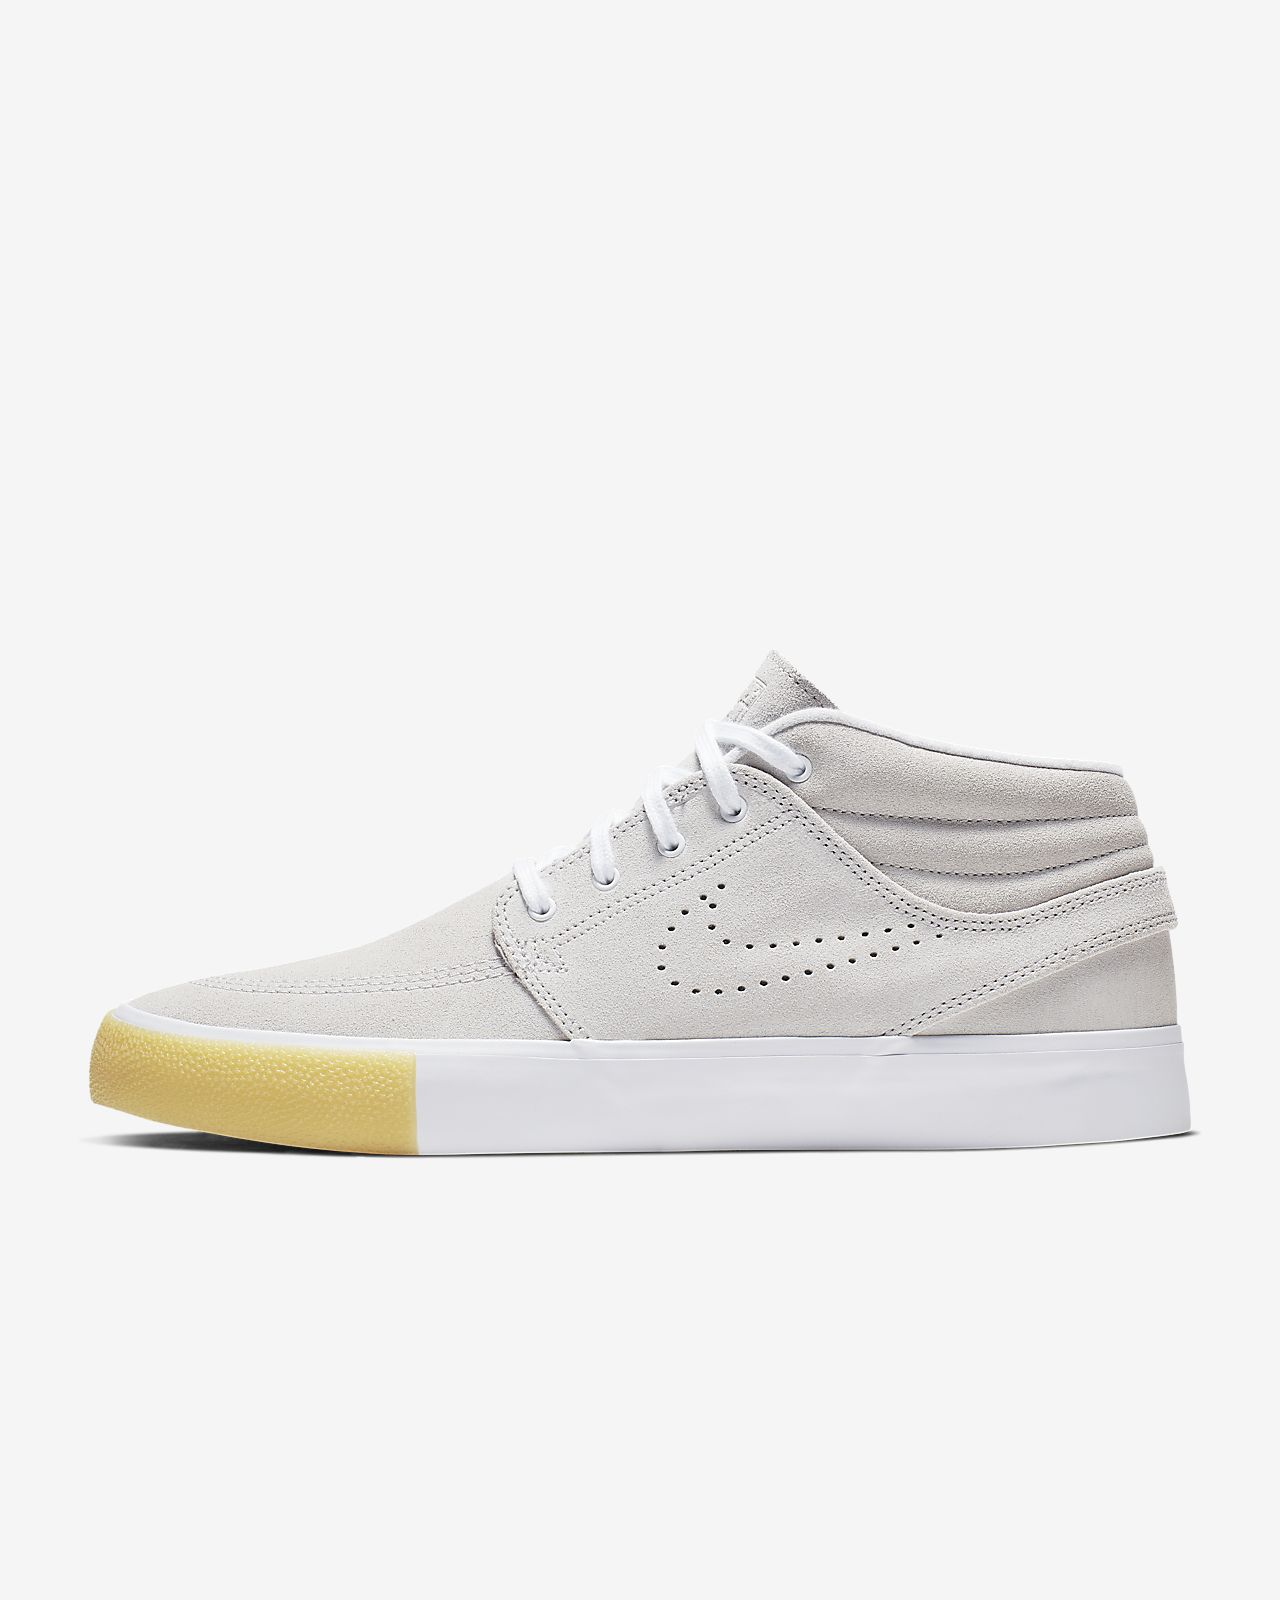 finest selection eae18 578a6 ... Chaussure de skateboard Nike SB Zoom Stefan Janoski Mid RM SE